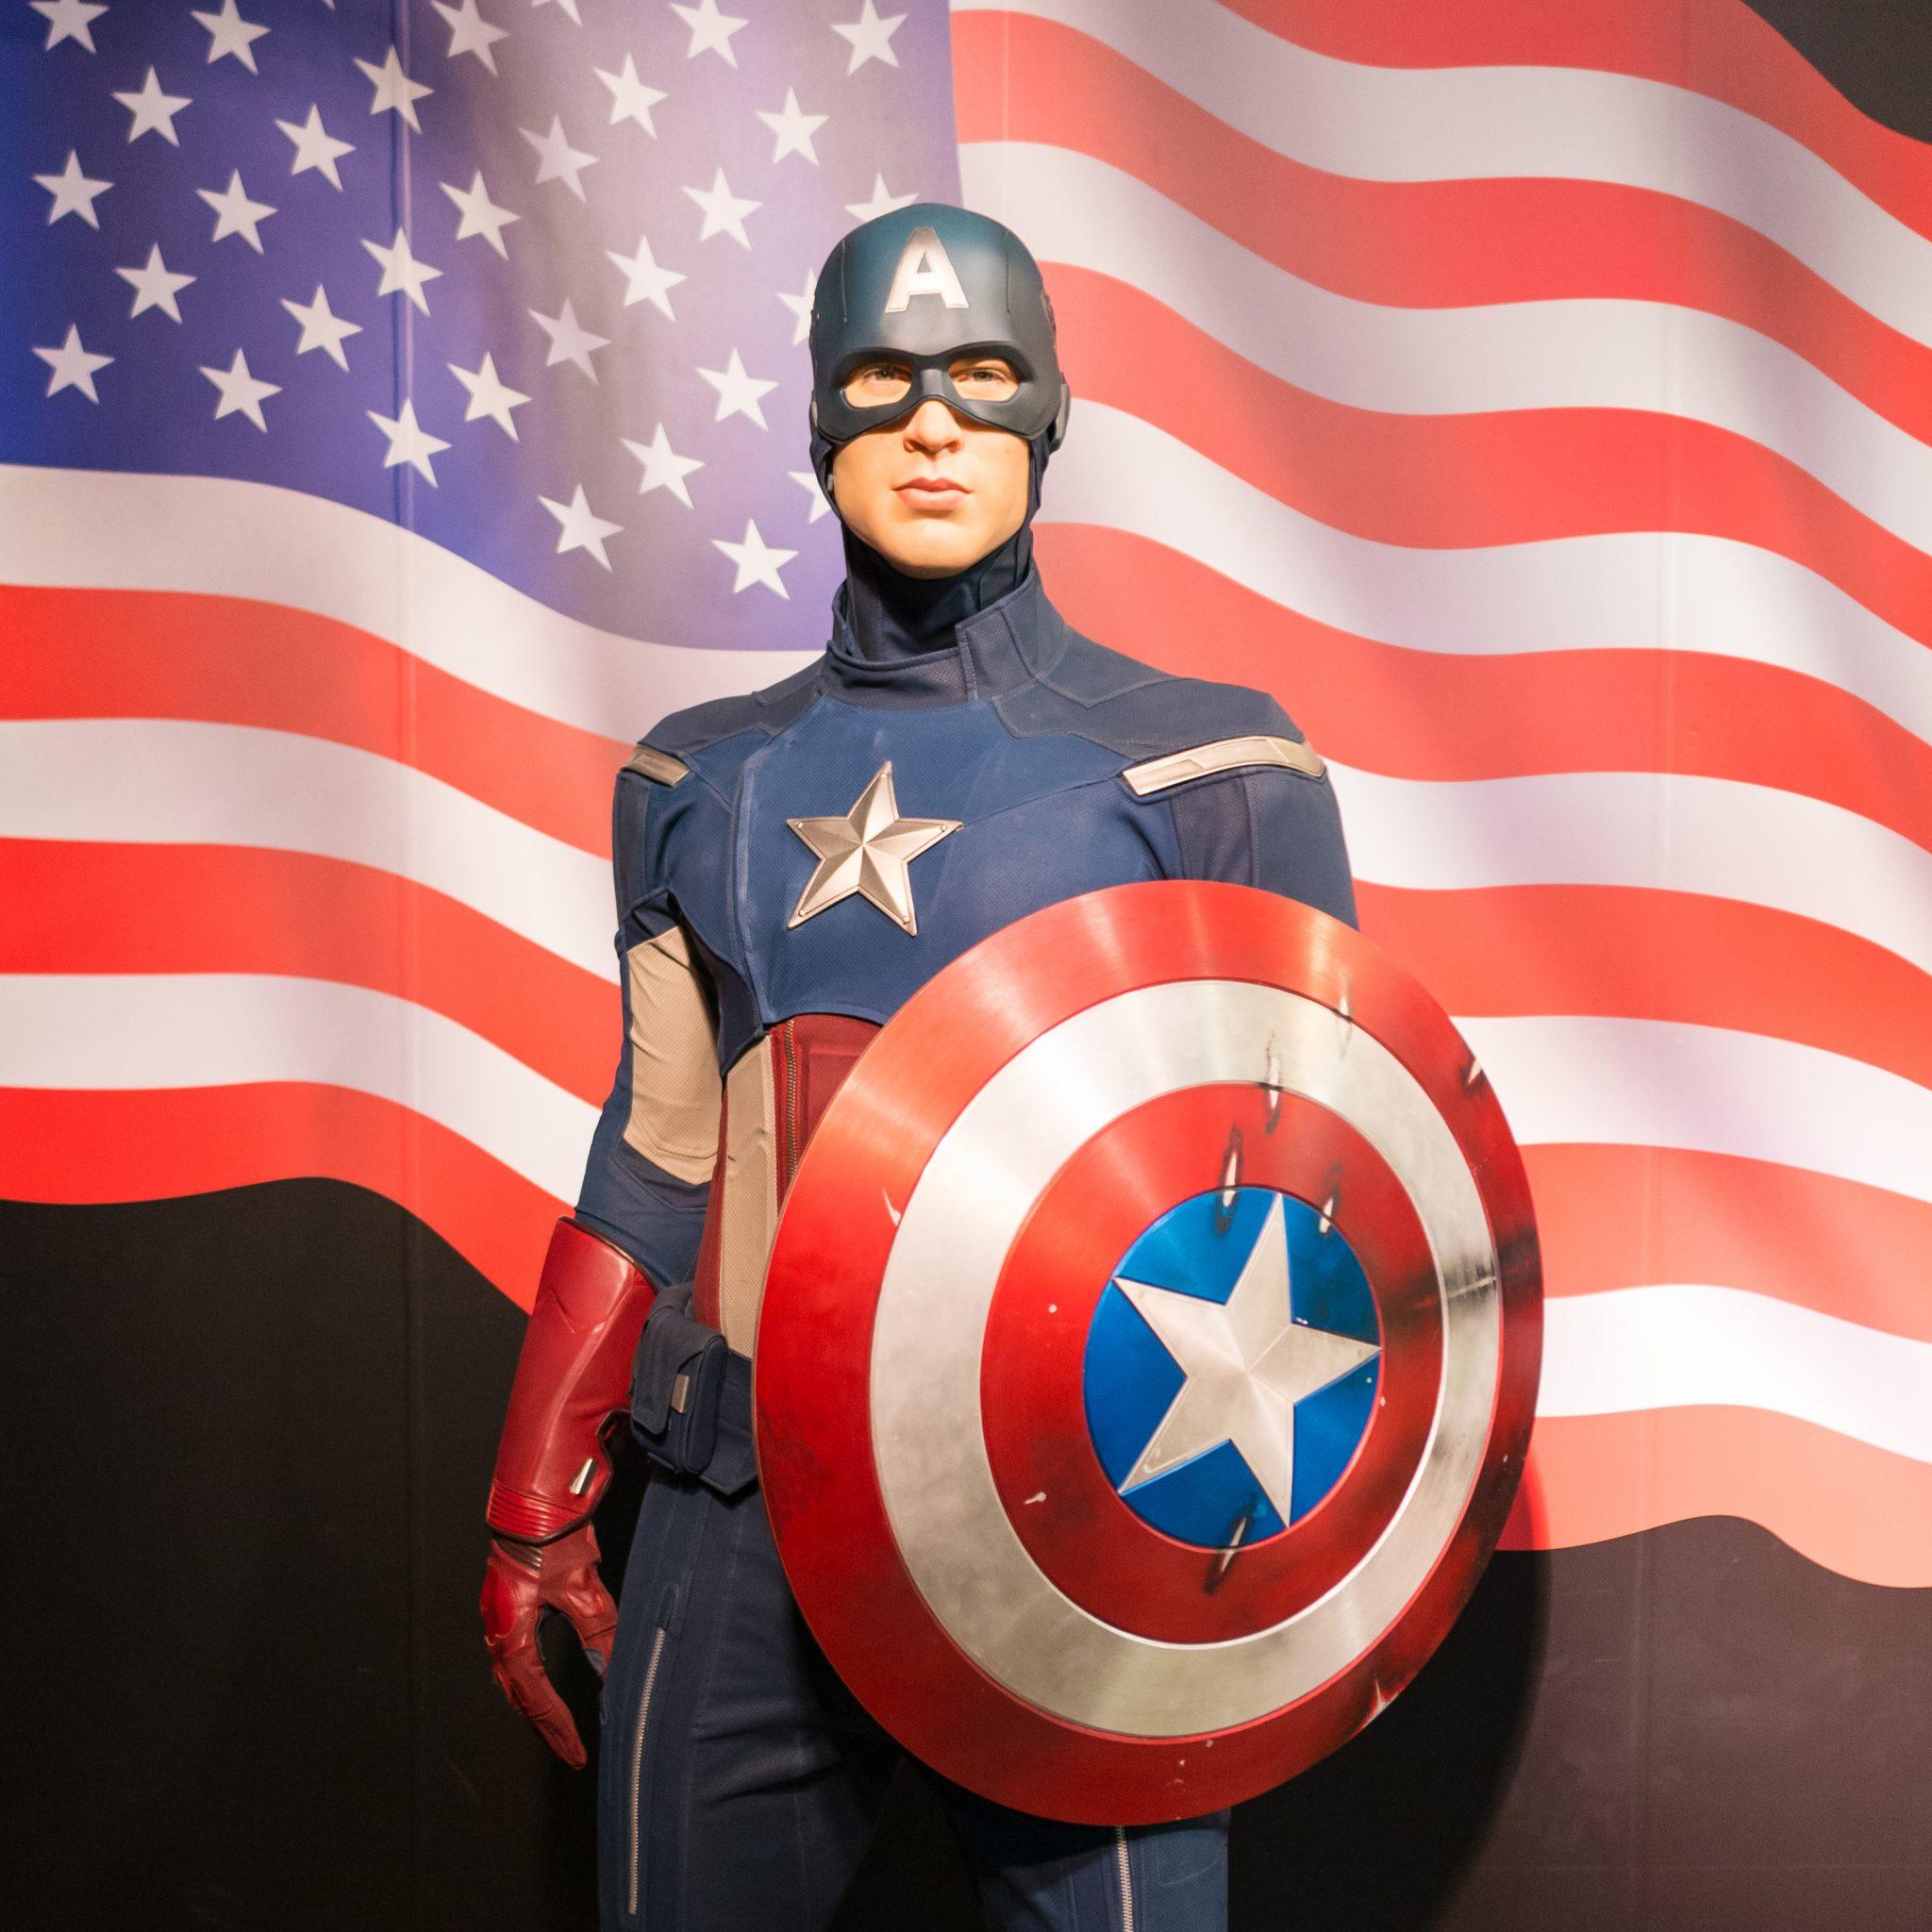 A waxwork of Captain America